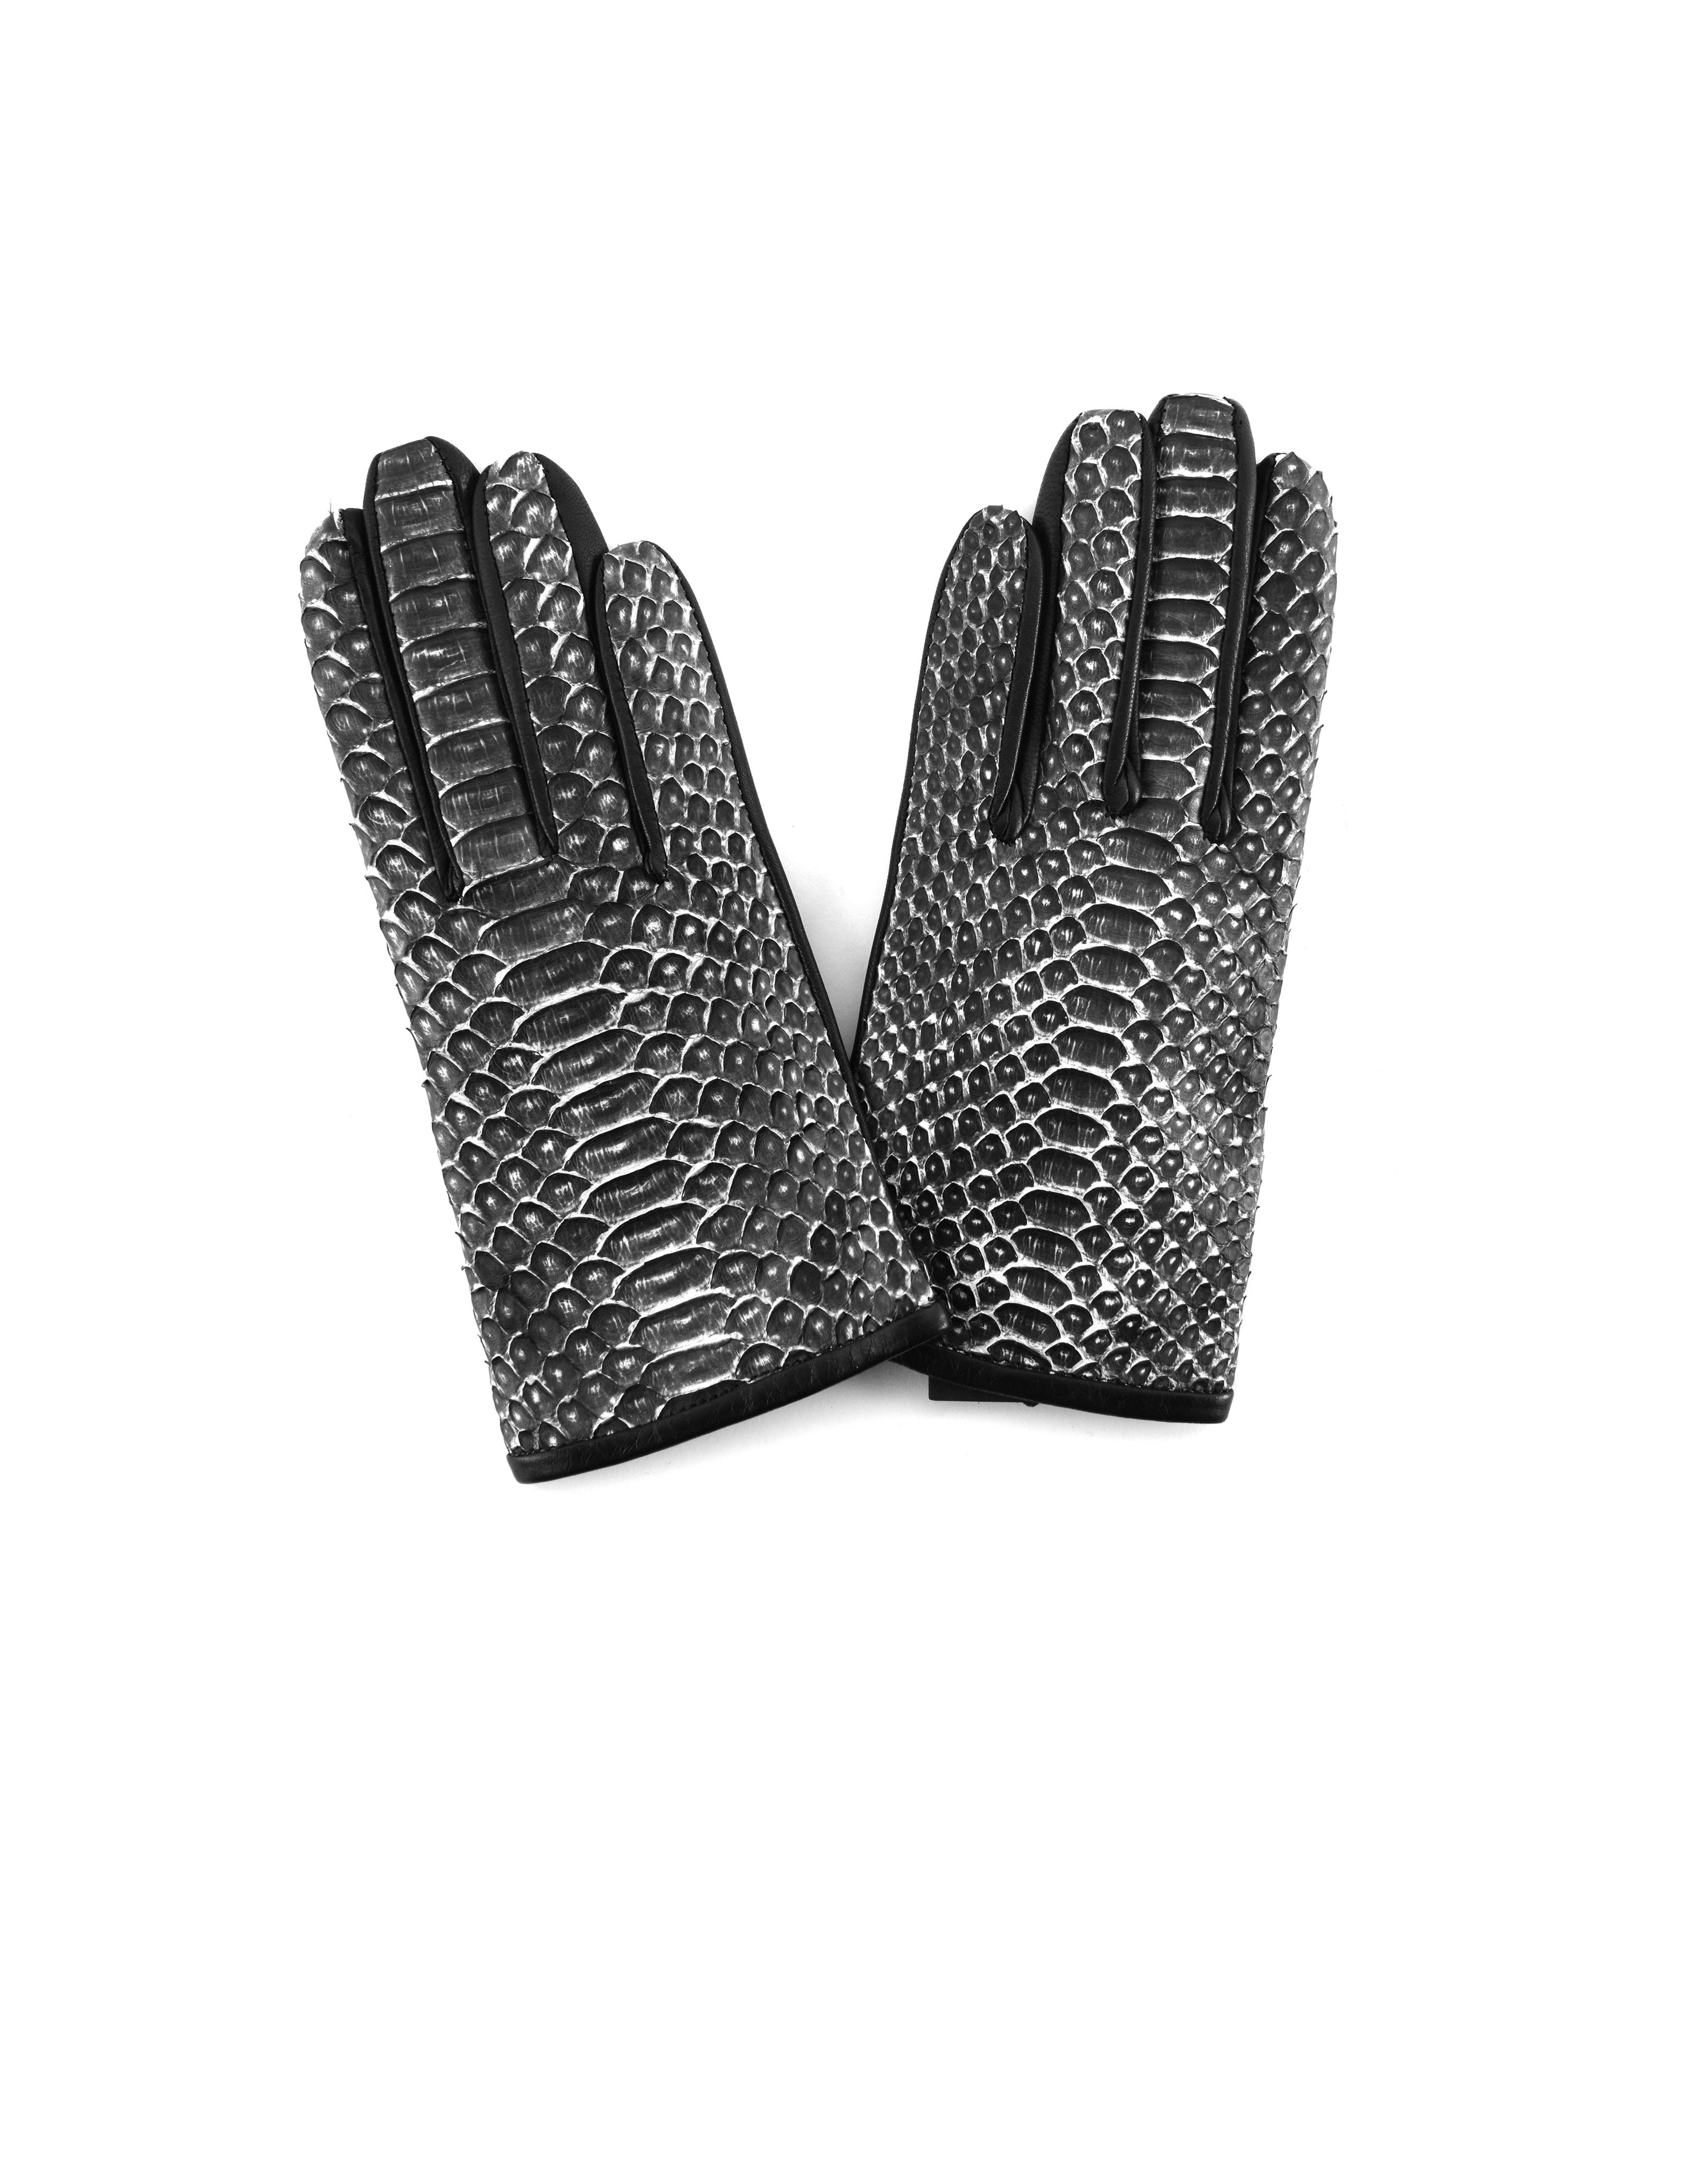 Haider Ackermann | Перчатки из кожи питона | Clouty